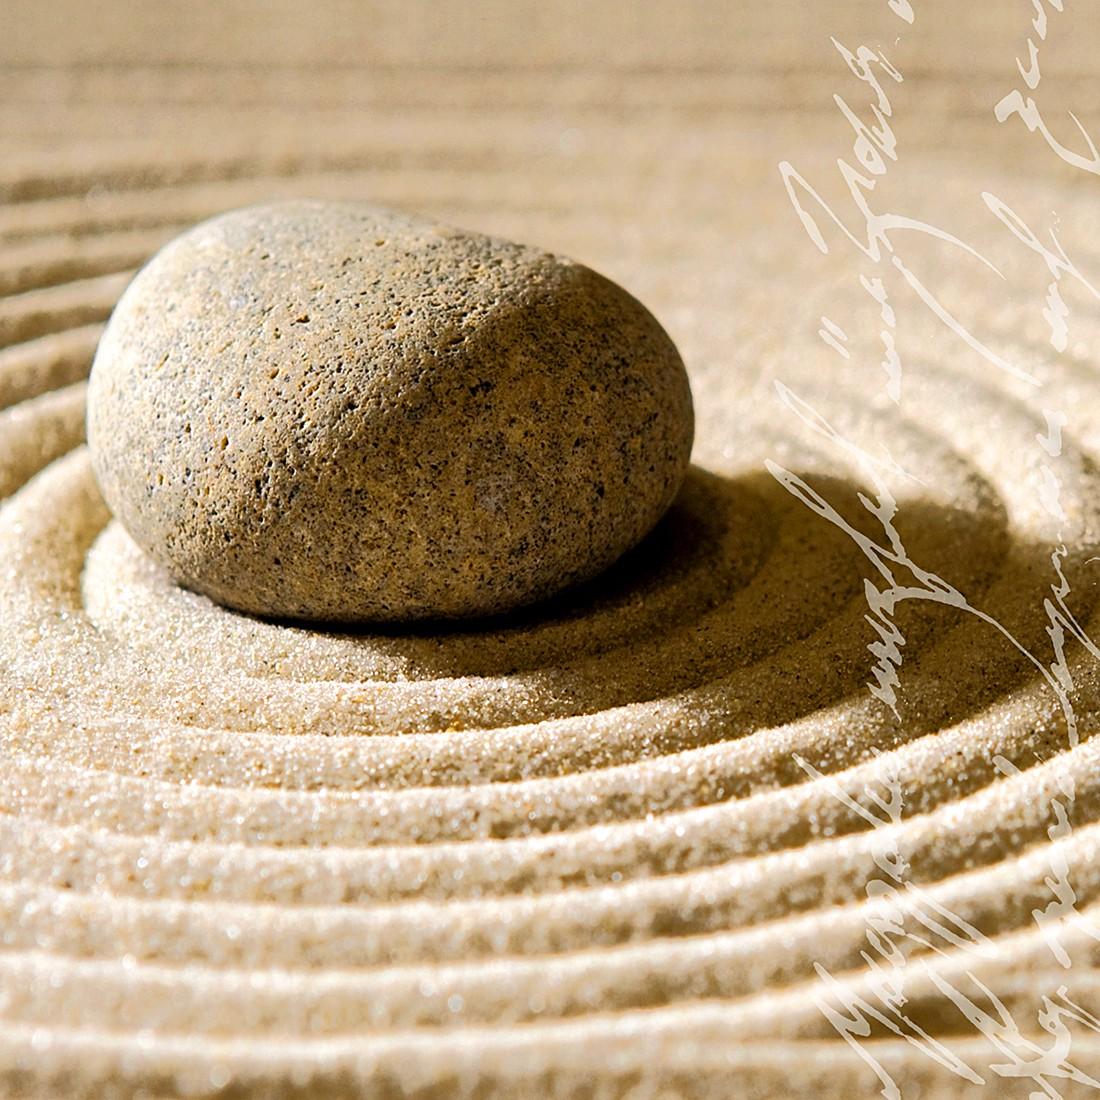 Glasbild Sand Stone 30×30, Pro Art kaufen